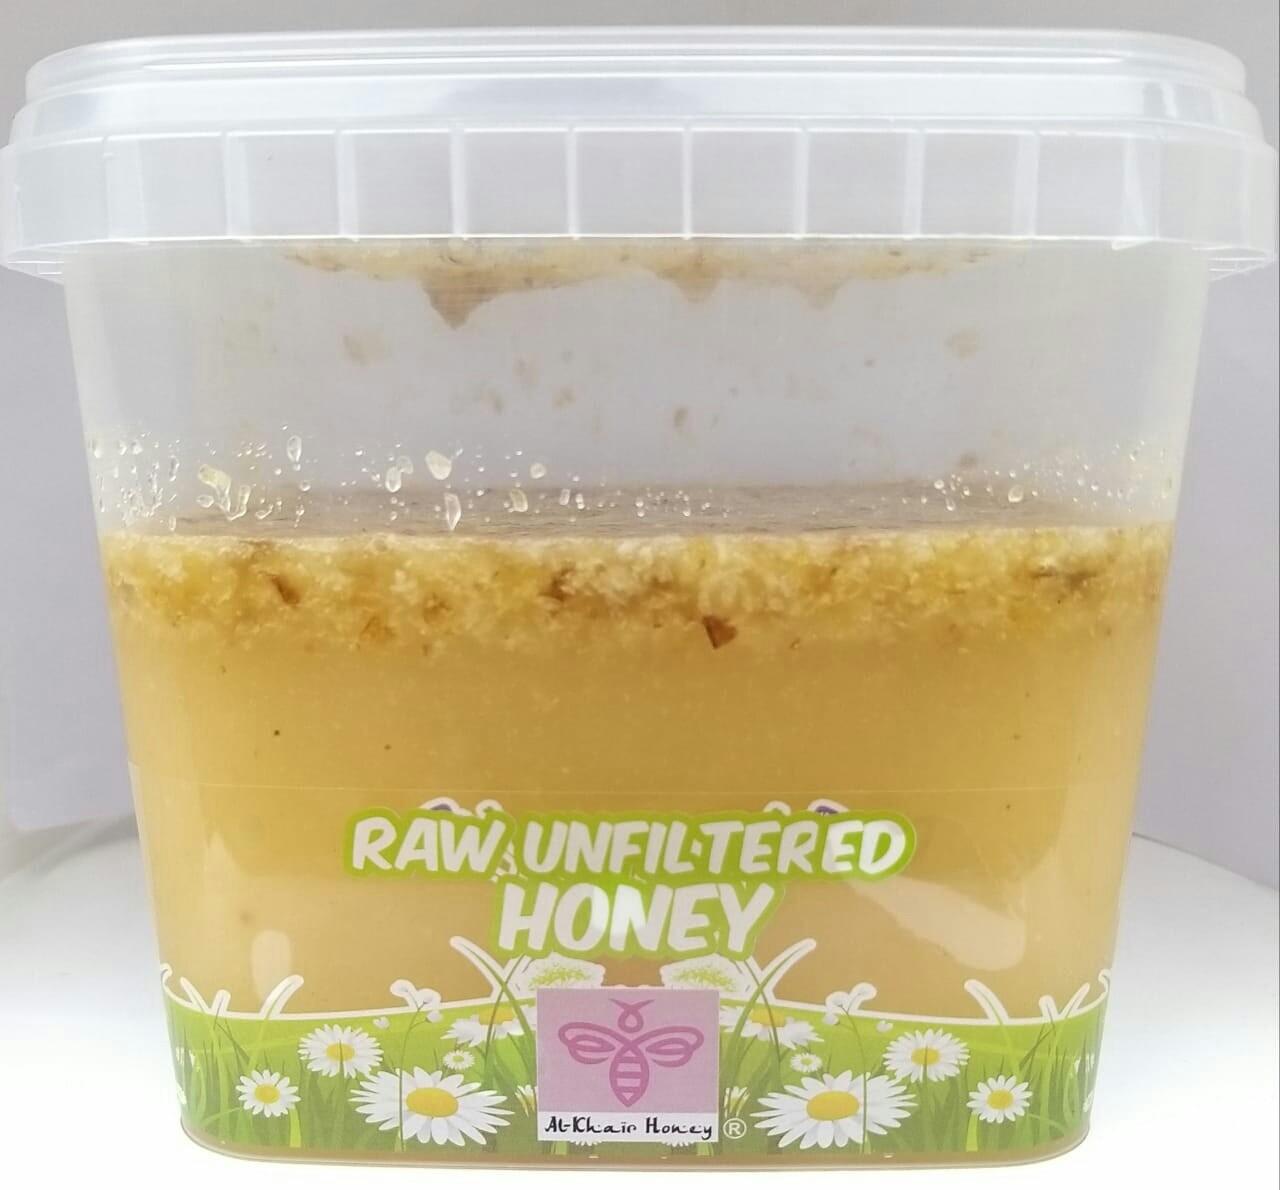 Unfiltered Raw Honey, 1kg Tub